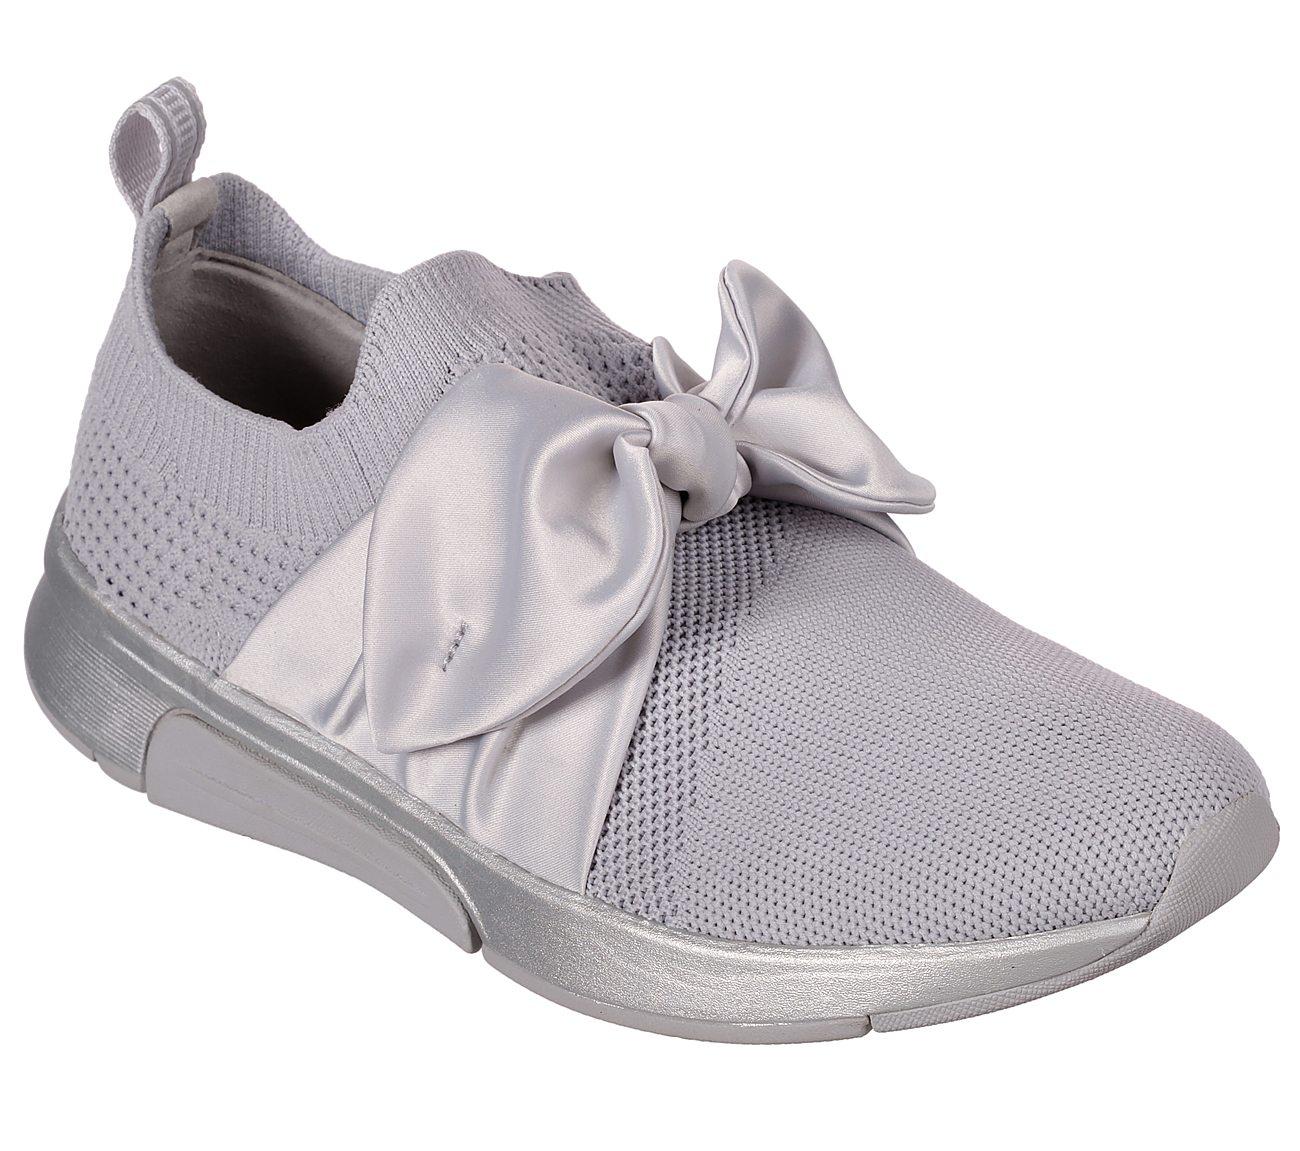 Buy SKECHERS Modern Jogger - Debbie Mark Nason Shoes only  130.00